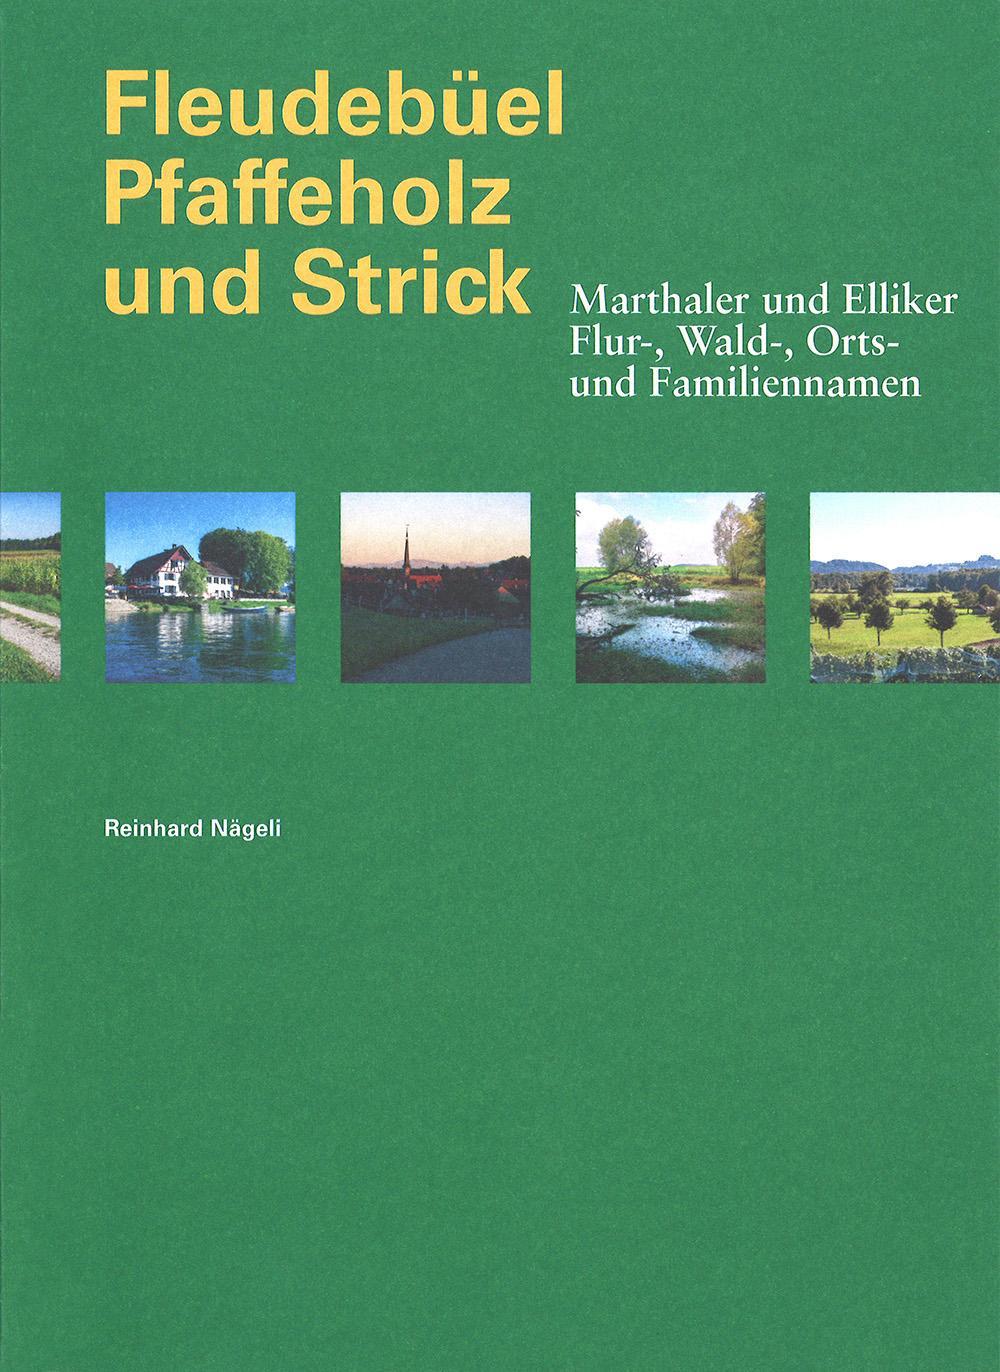 «Fleudebüel, Pfaffeholz und Strick», Marthalen 2020, Signatur: 2021 B 10343